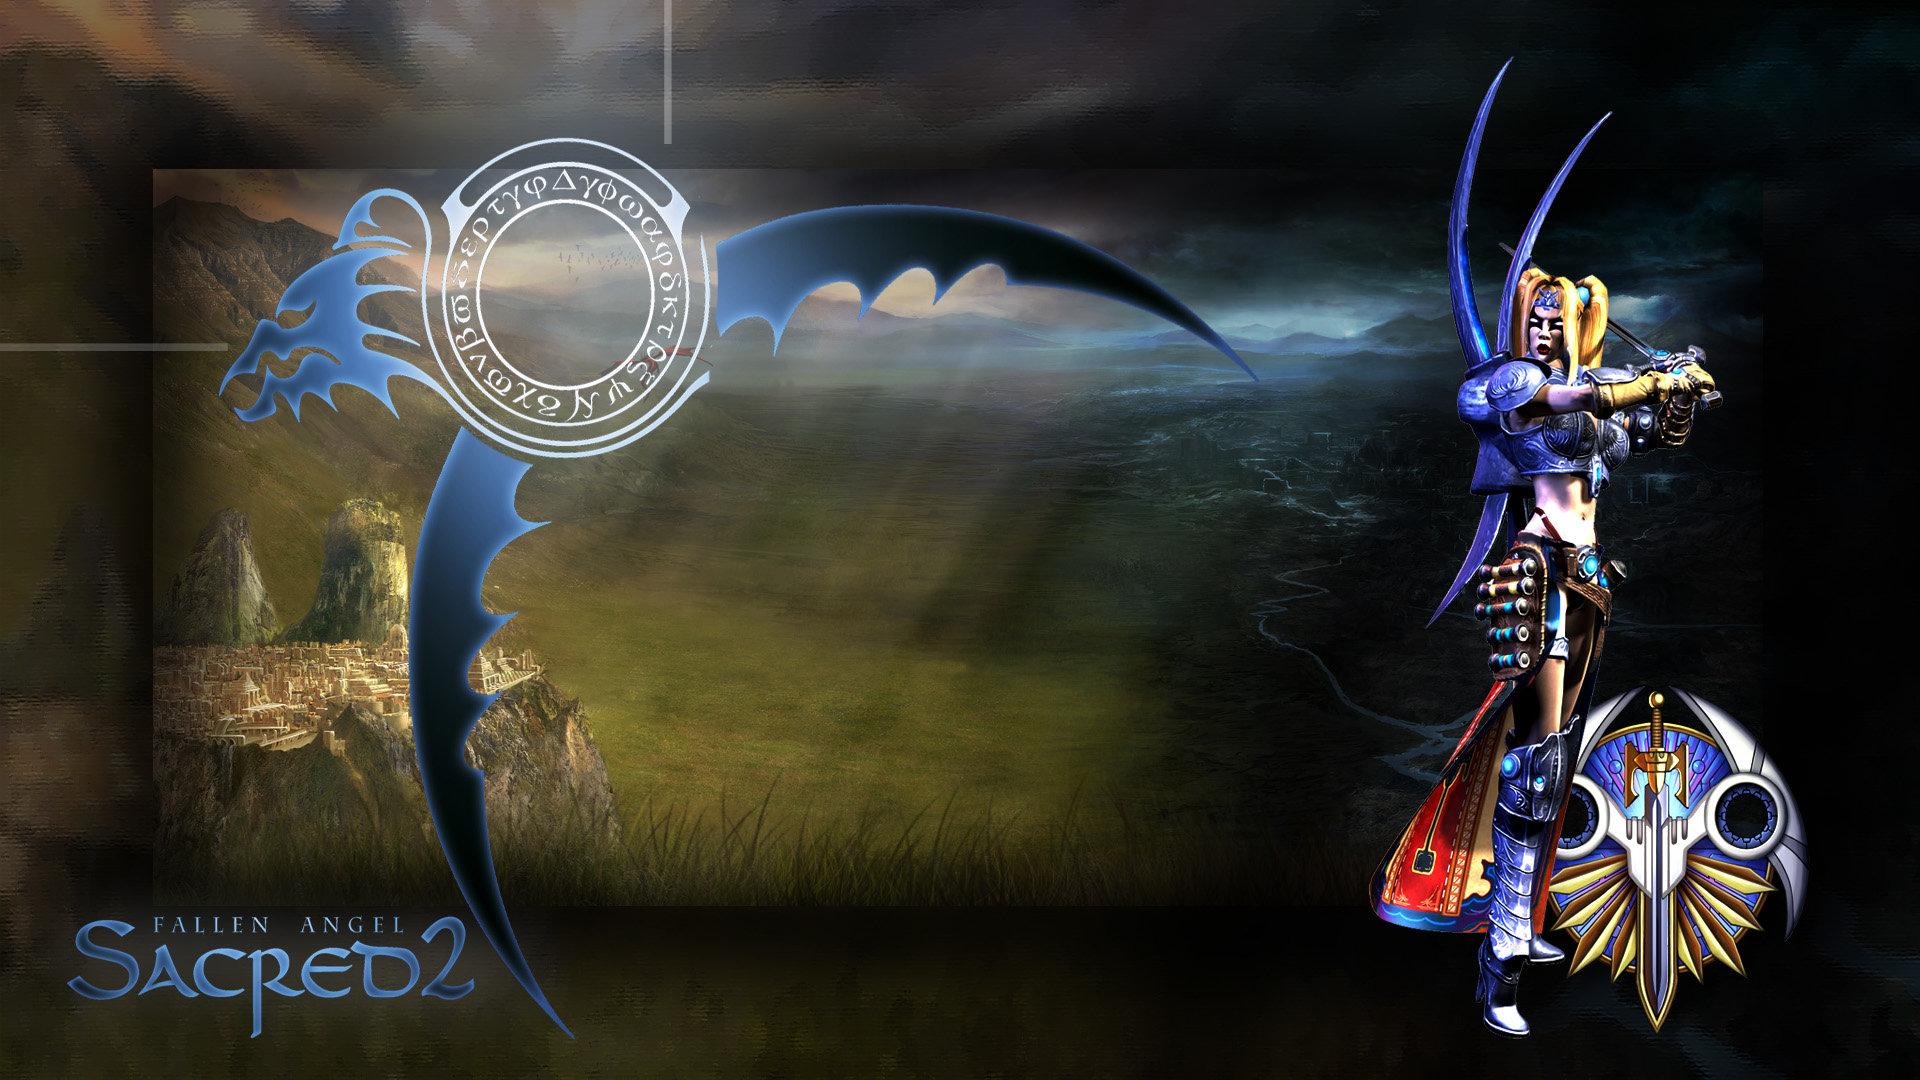 Sacred 2 Seraphim PS3 Theme HD by BioDio 1920x1080